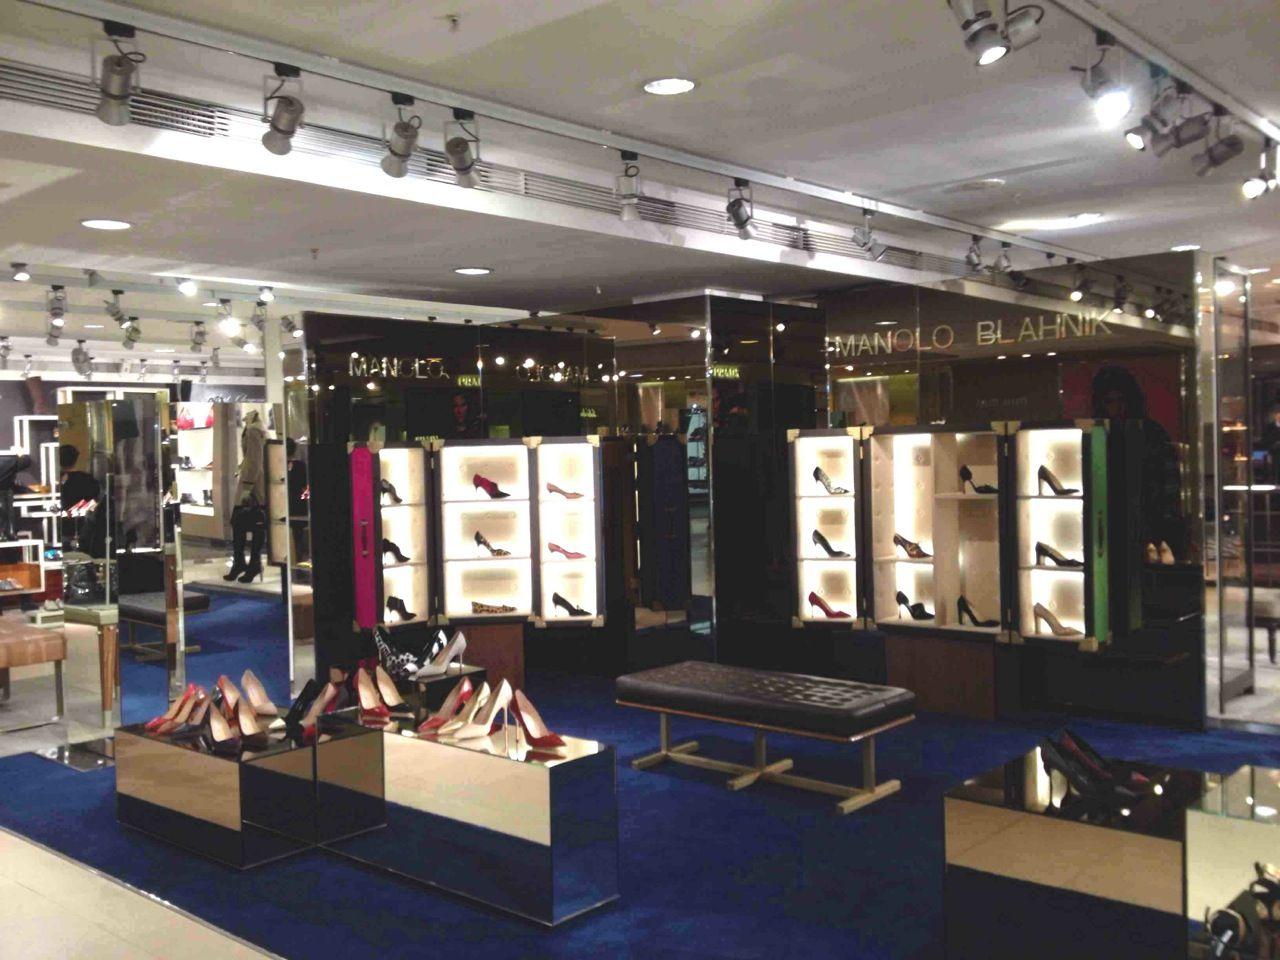 Manolo Blahnik -  Chaussures Après travaux !  fashion  Printemps  Paris c6f30fa37ecc